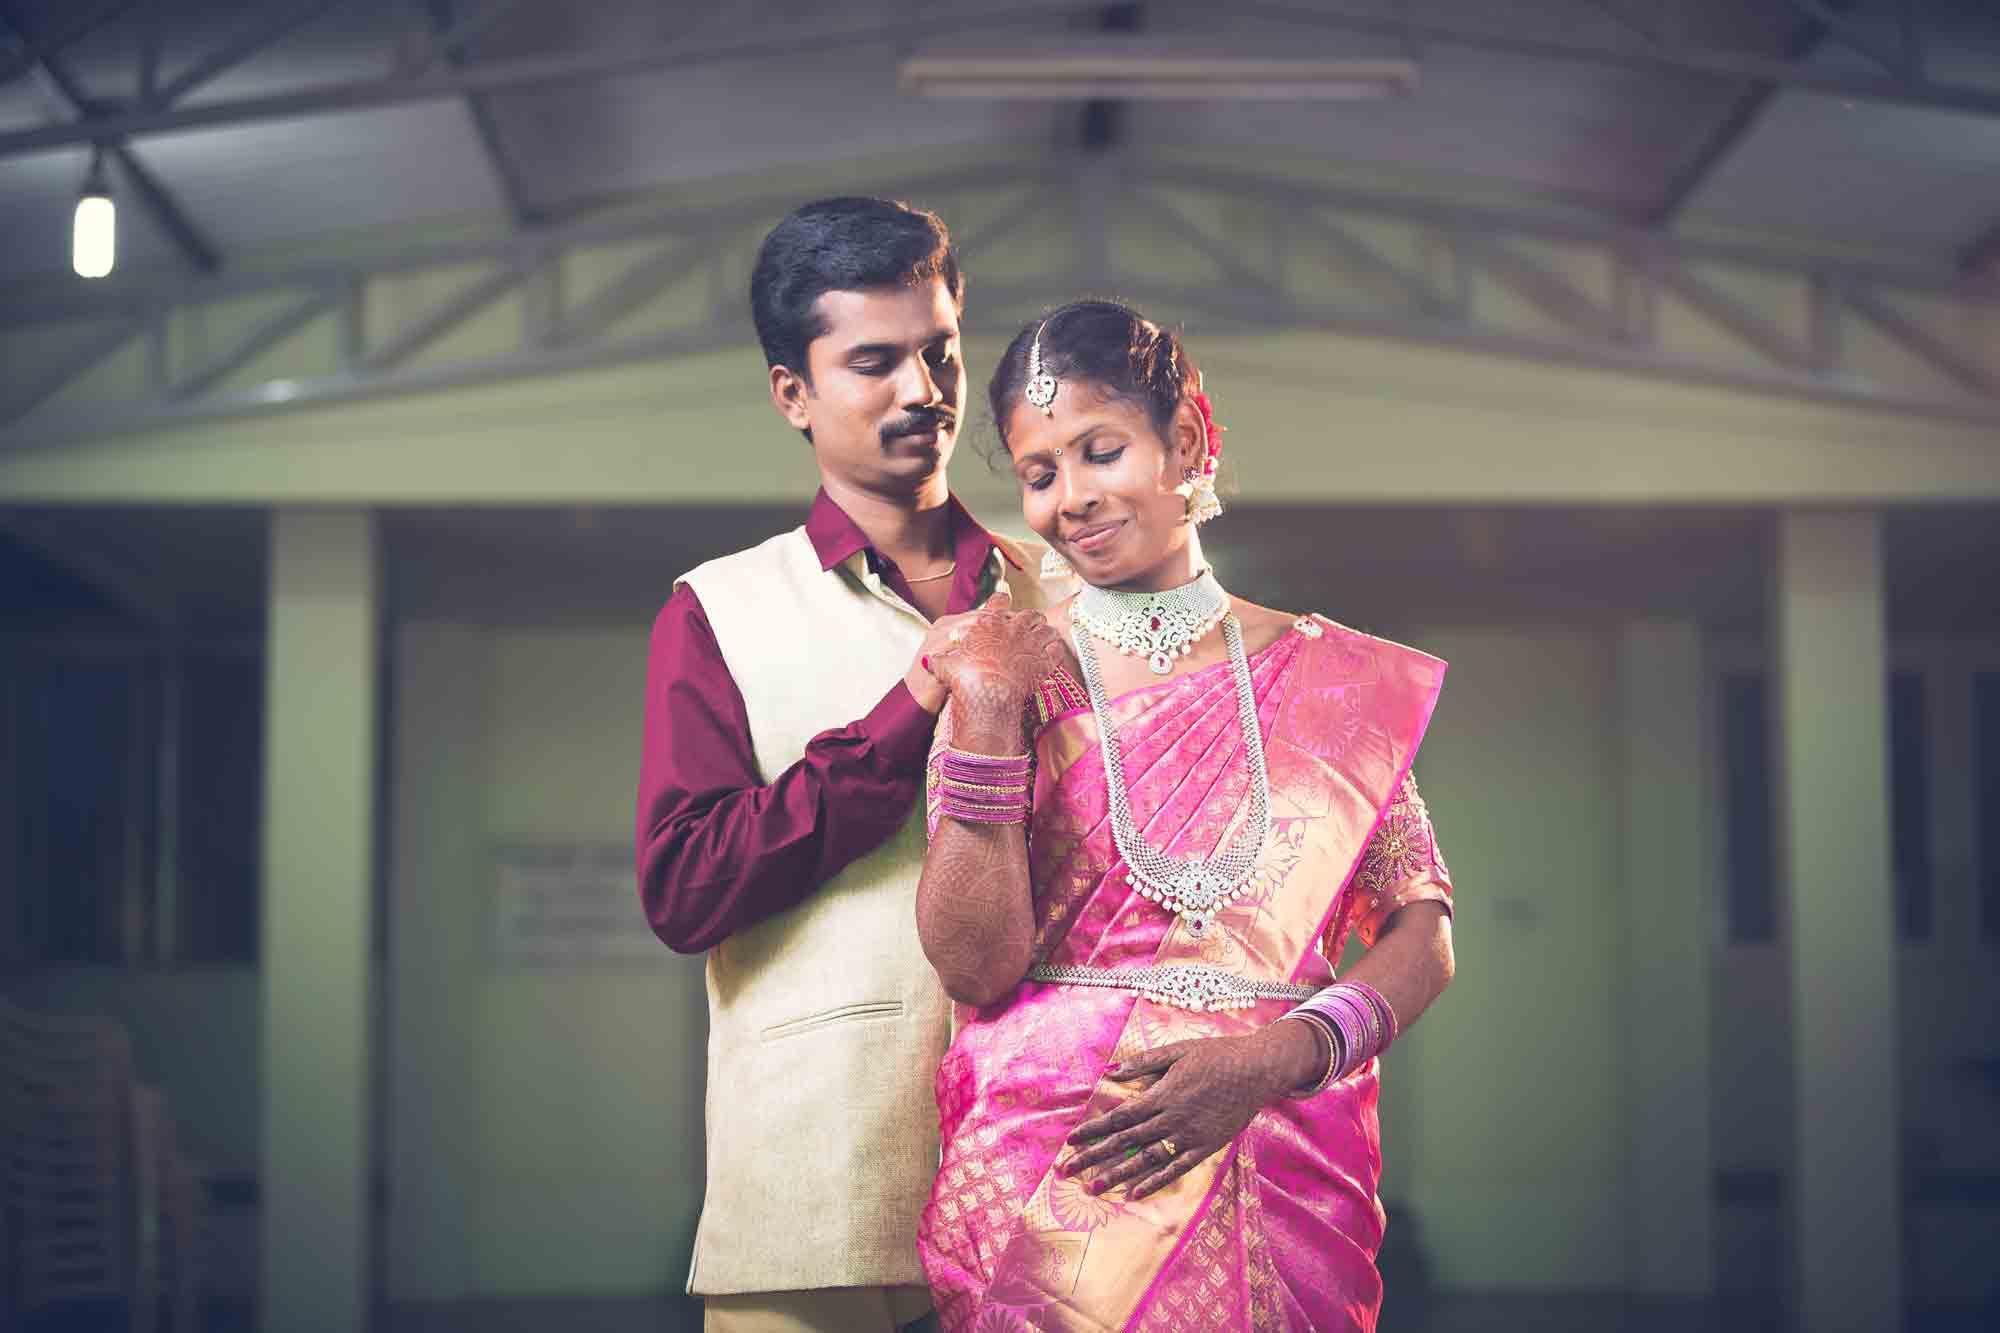 Chitra & Thangavadivel